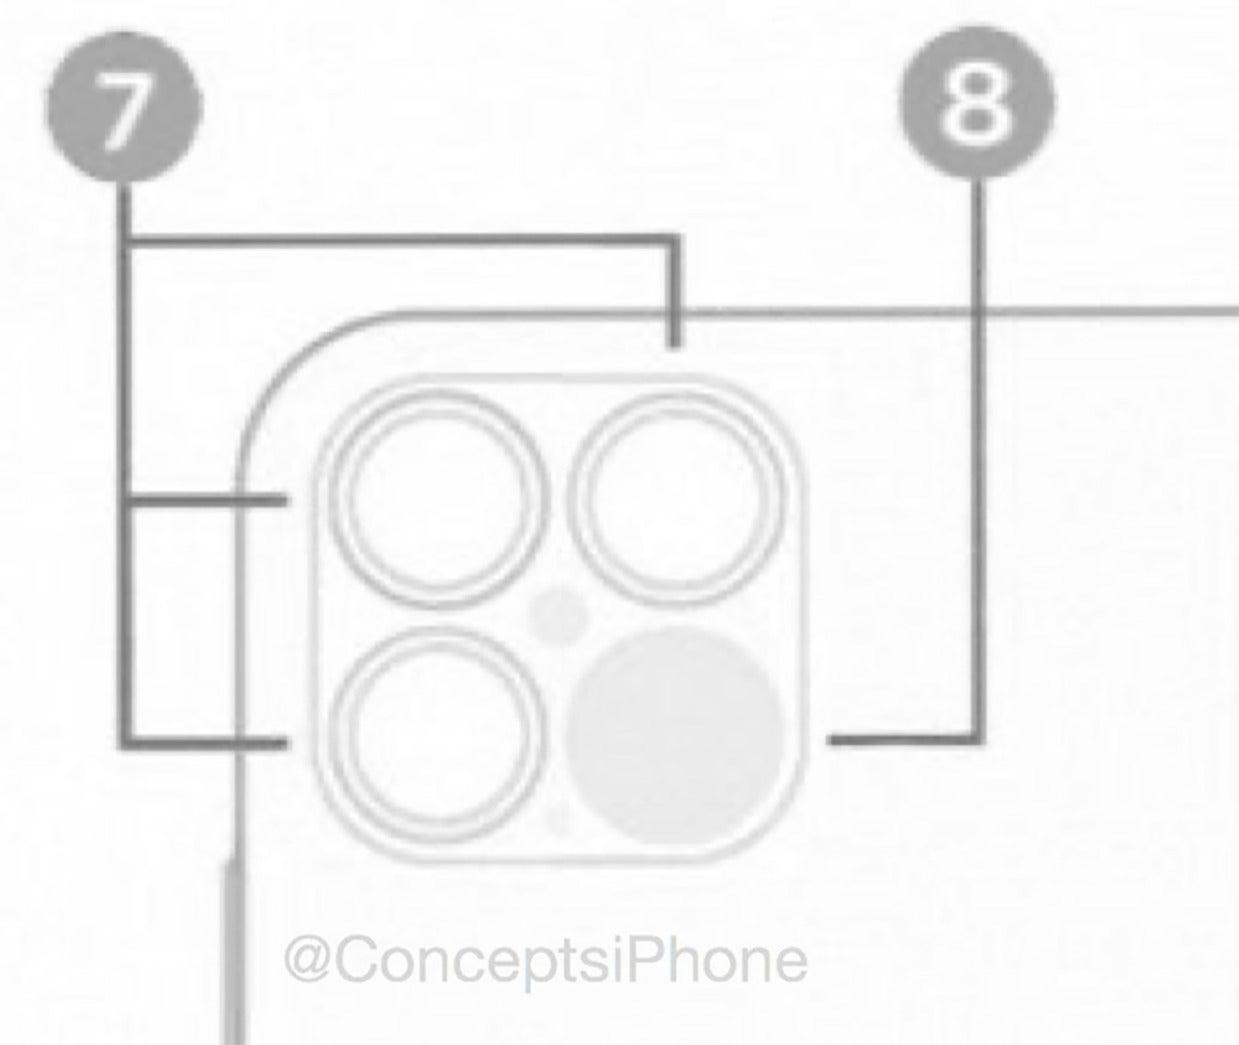 iPhone 12 rumors: 5G, OLED, camera, processor, release